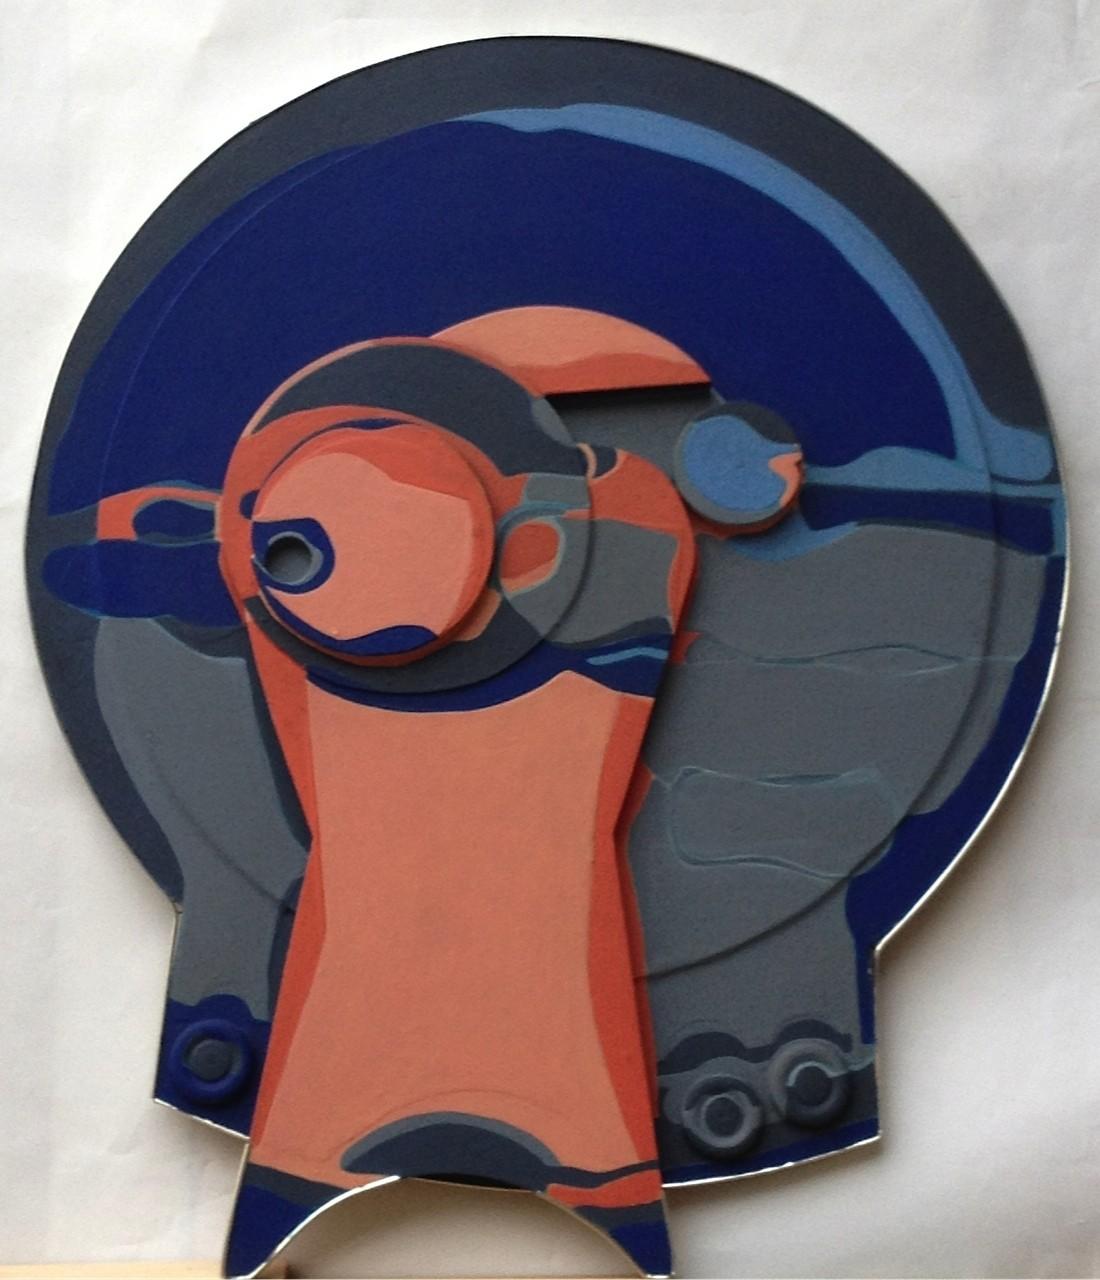 Keloid, Öl auf Pressspan, 92 x 76 x 5 cm, 1968 (#614)